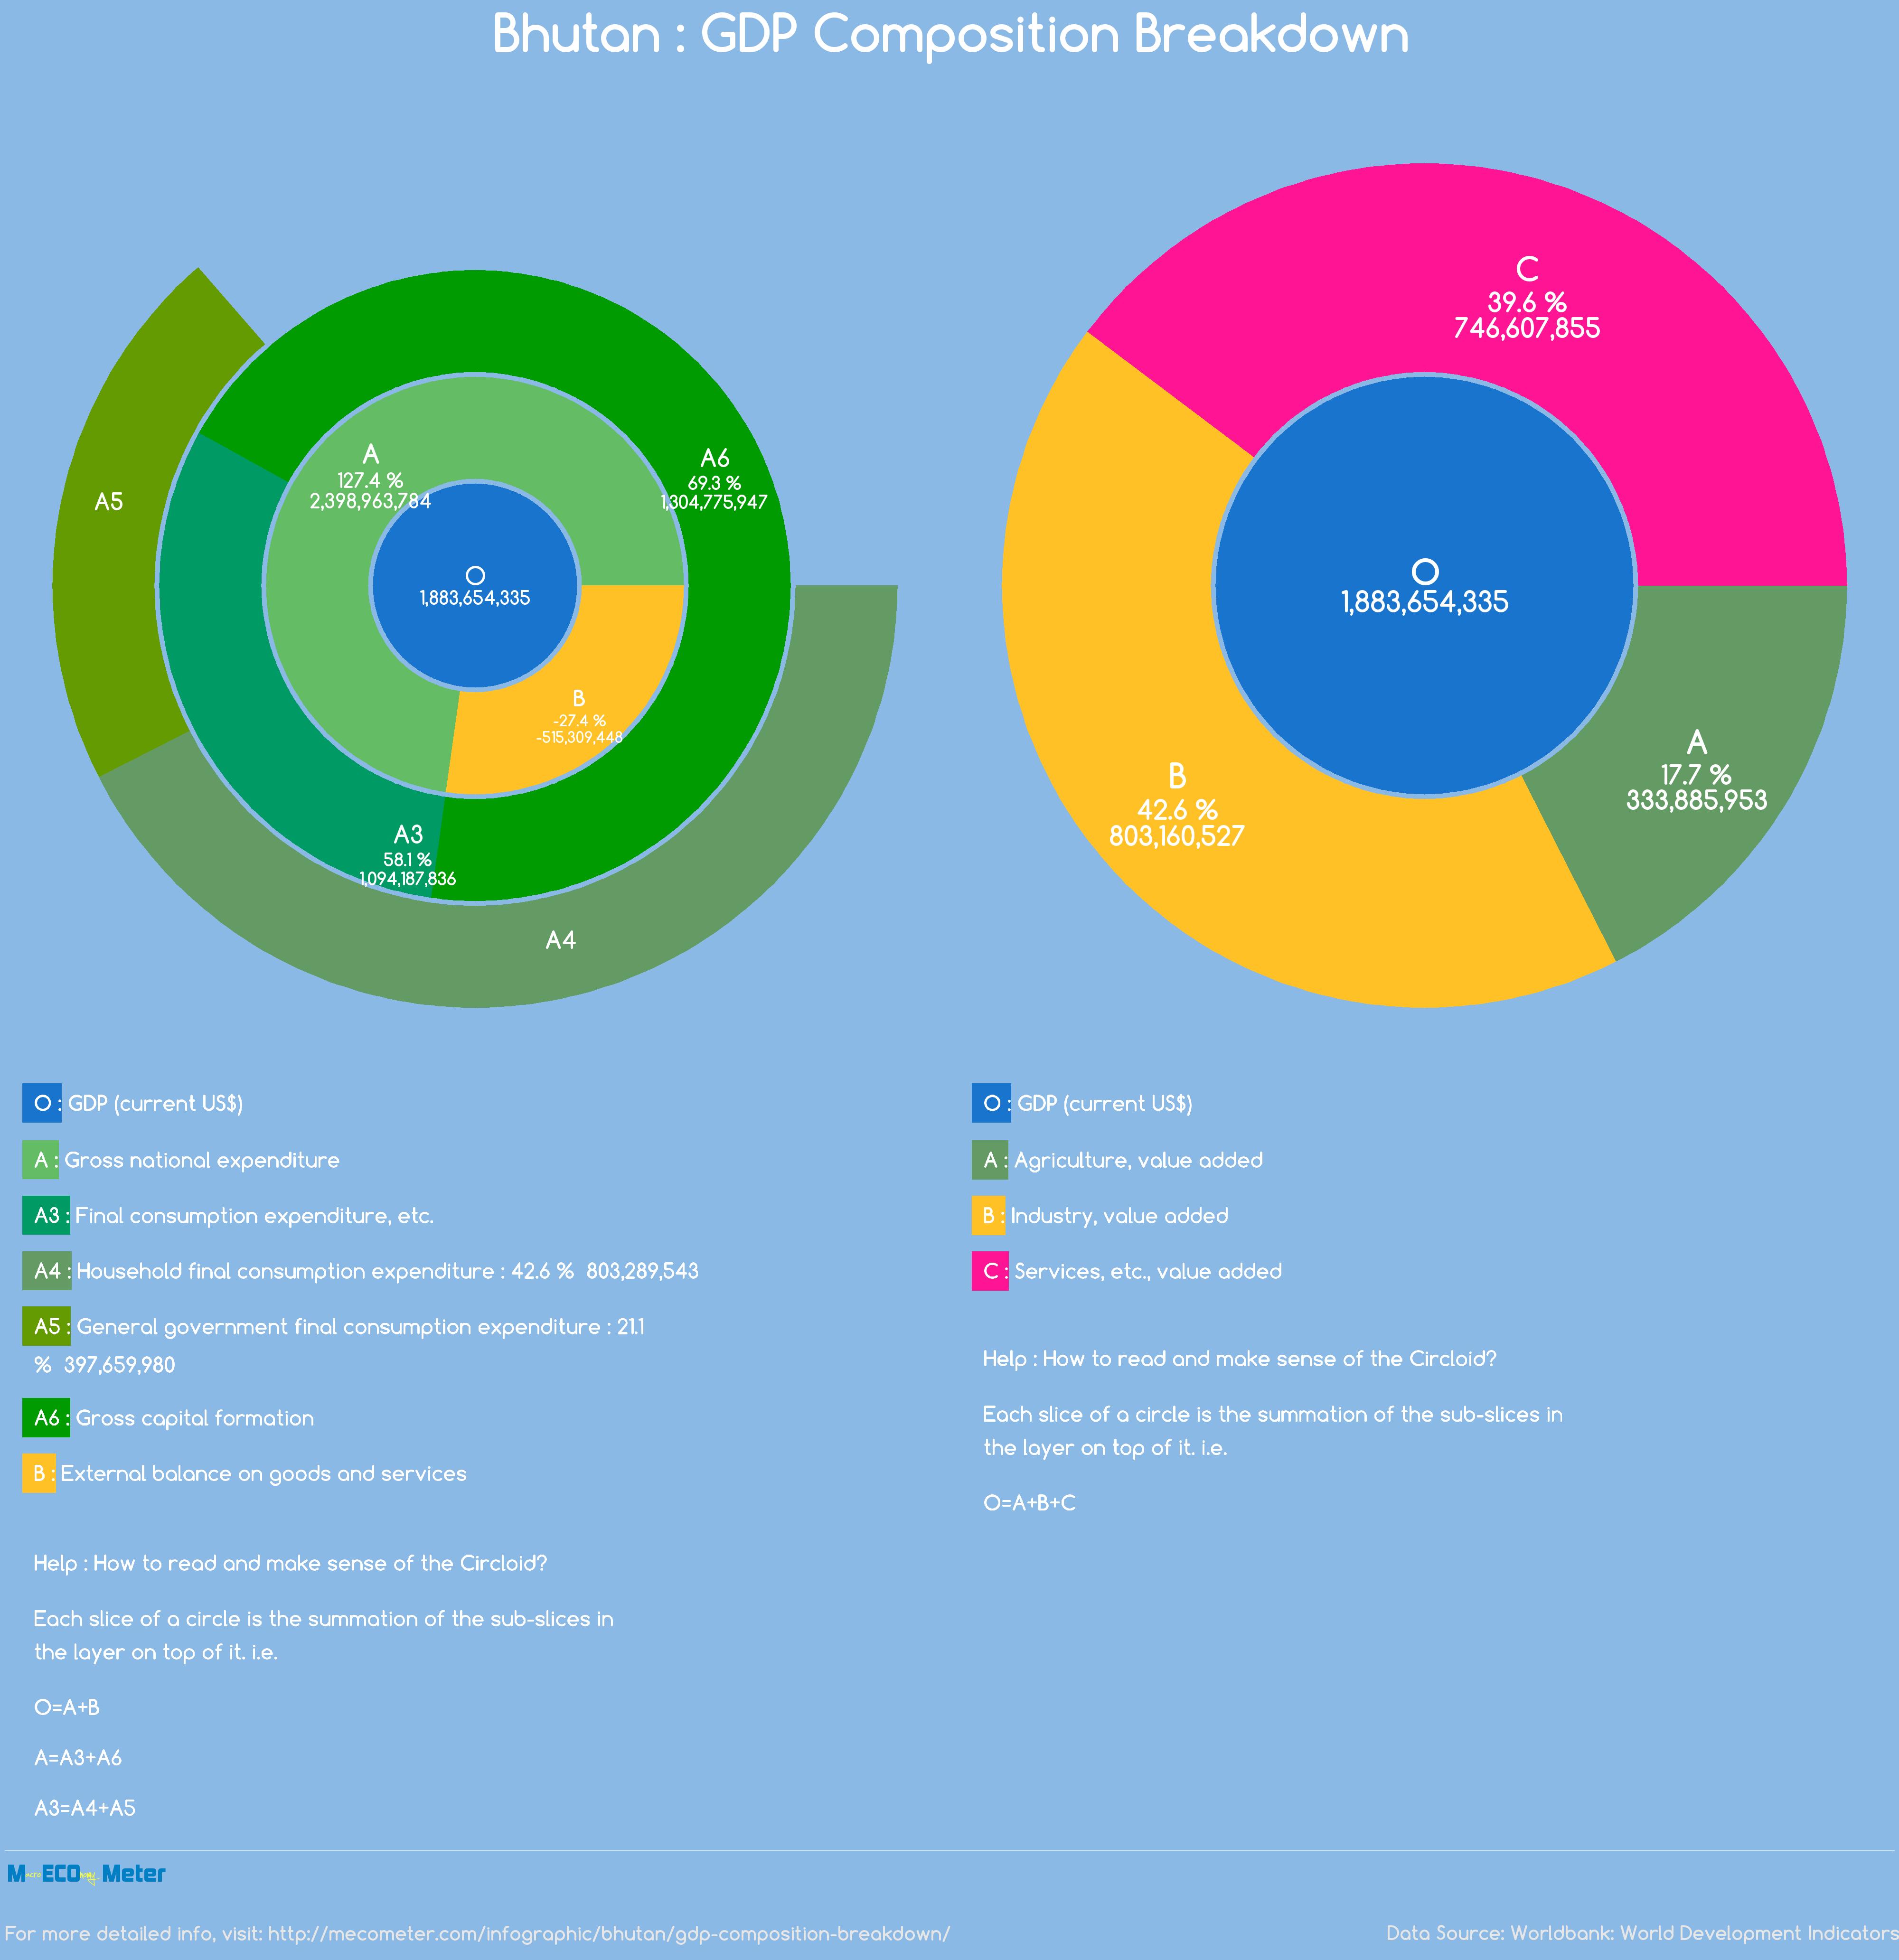 Bhutan : GDP Composition Breakdown